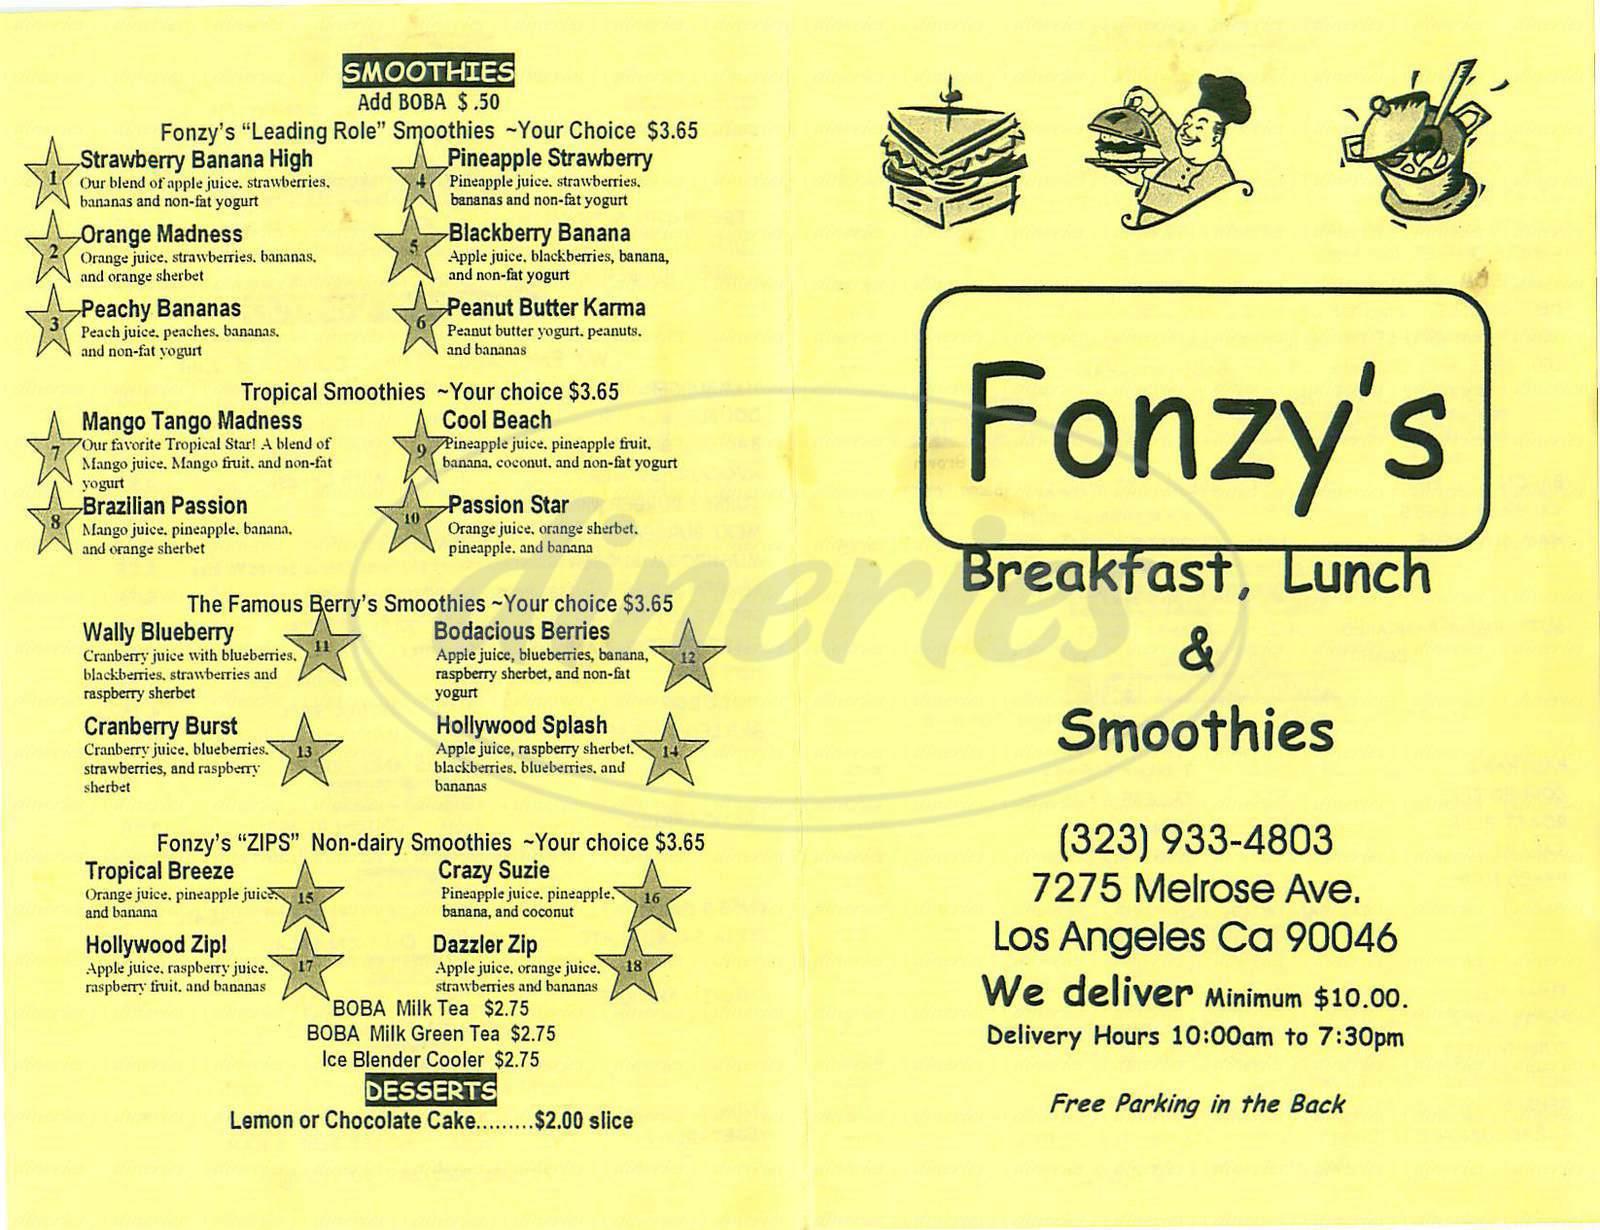 menu for Fonzy's